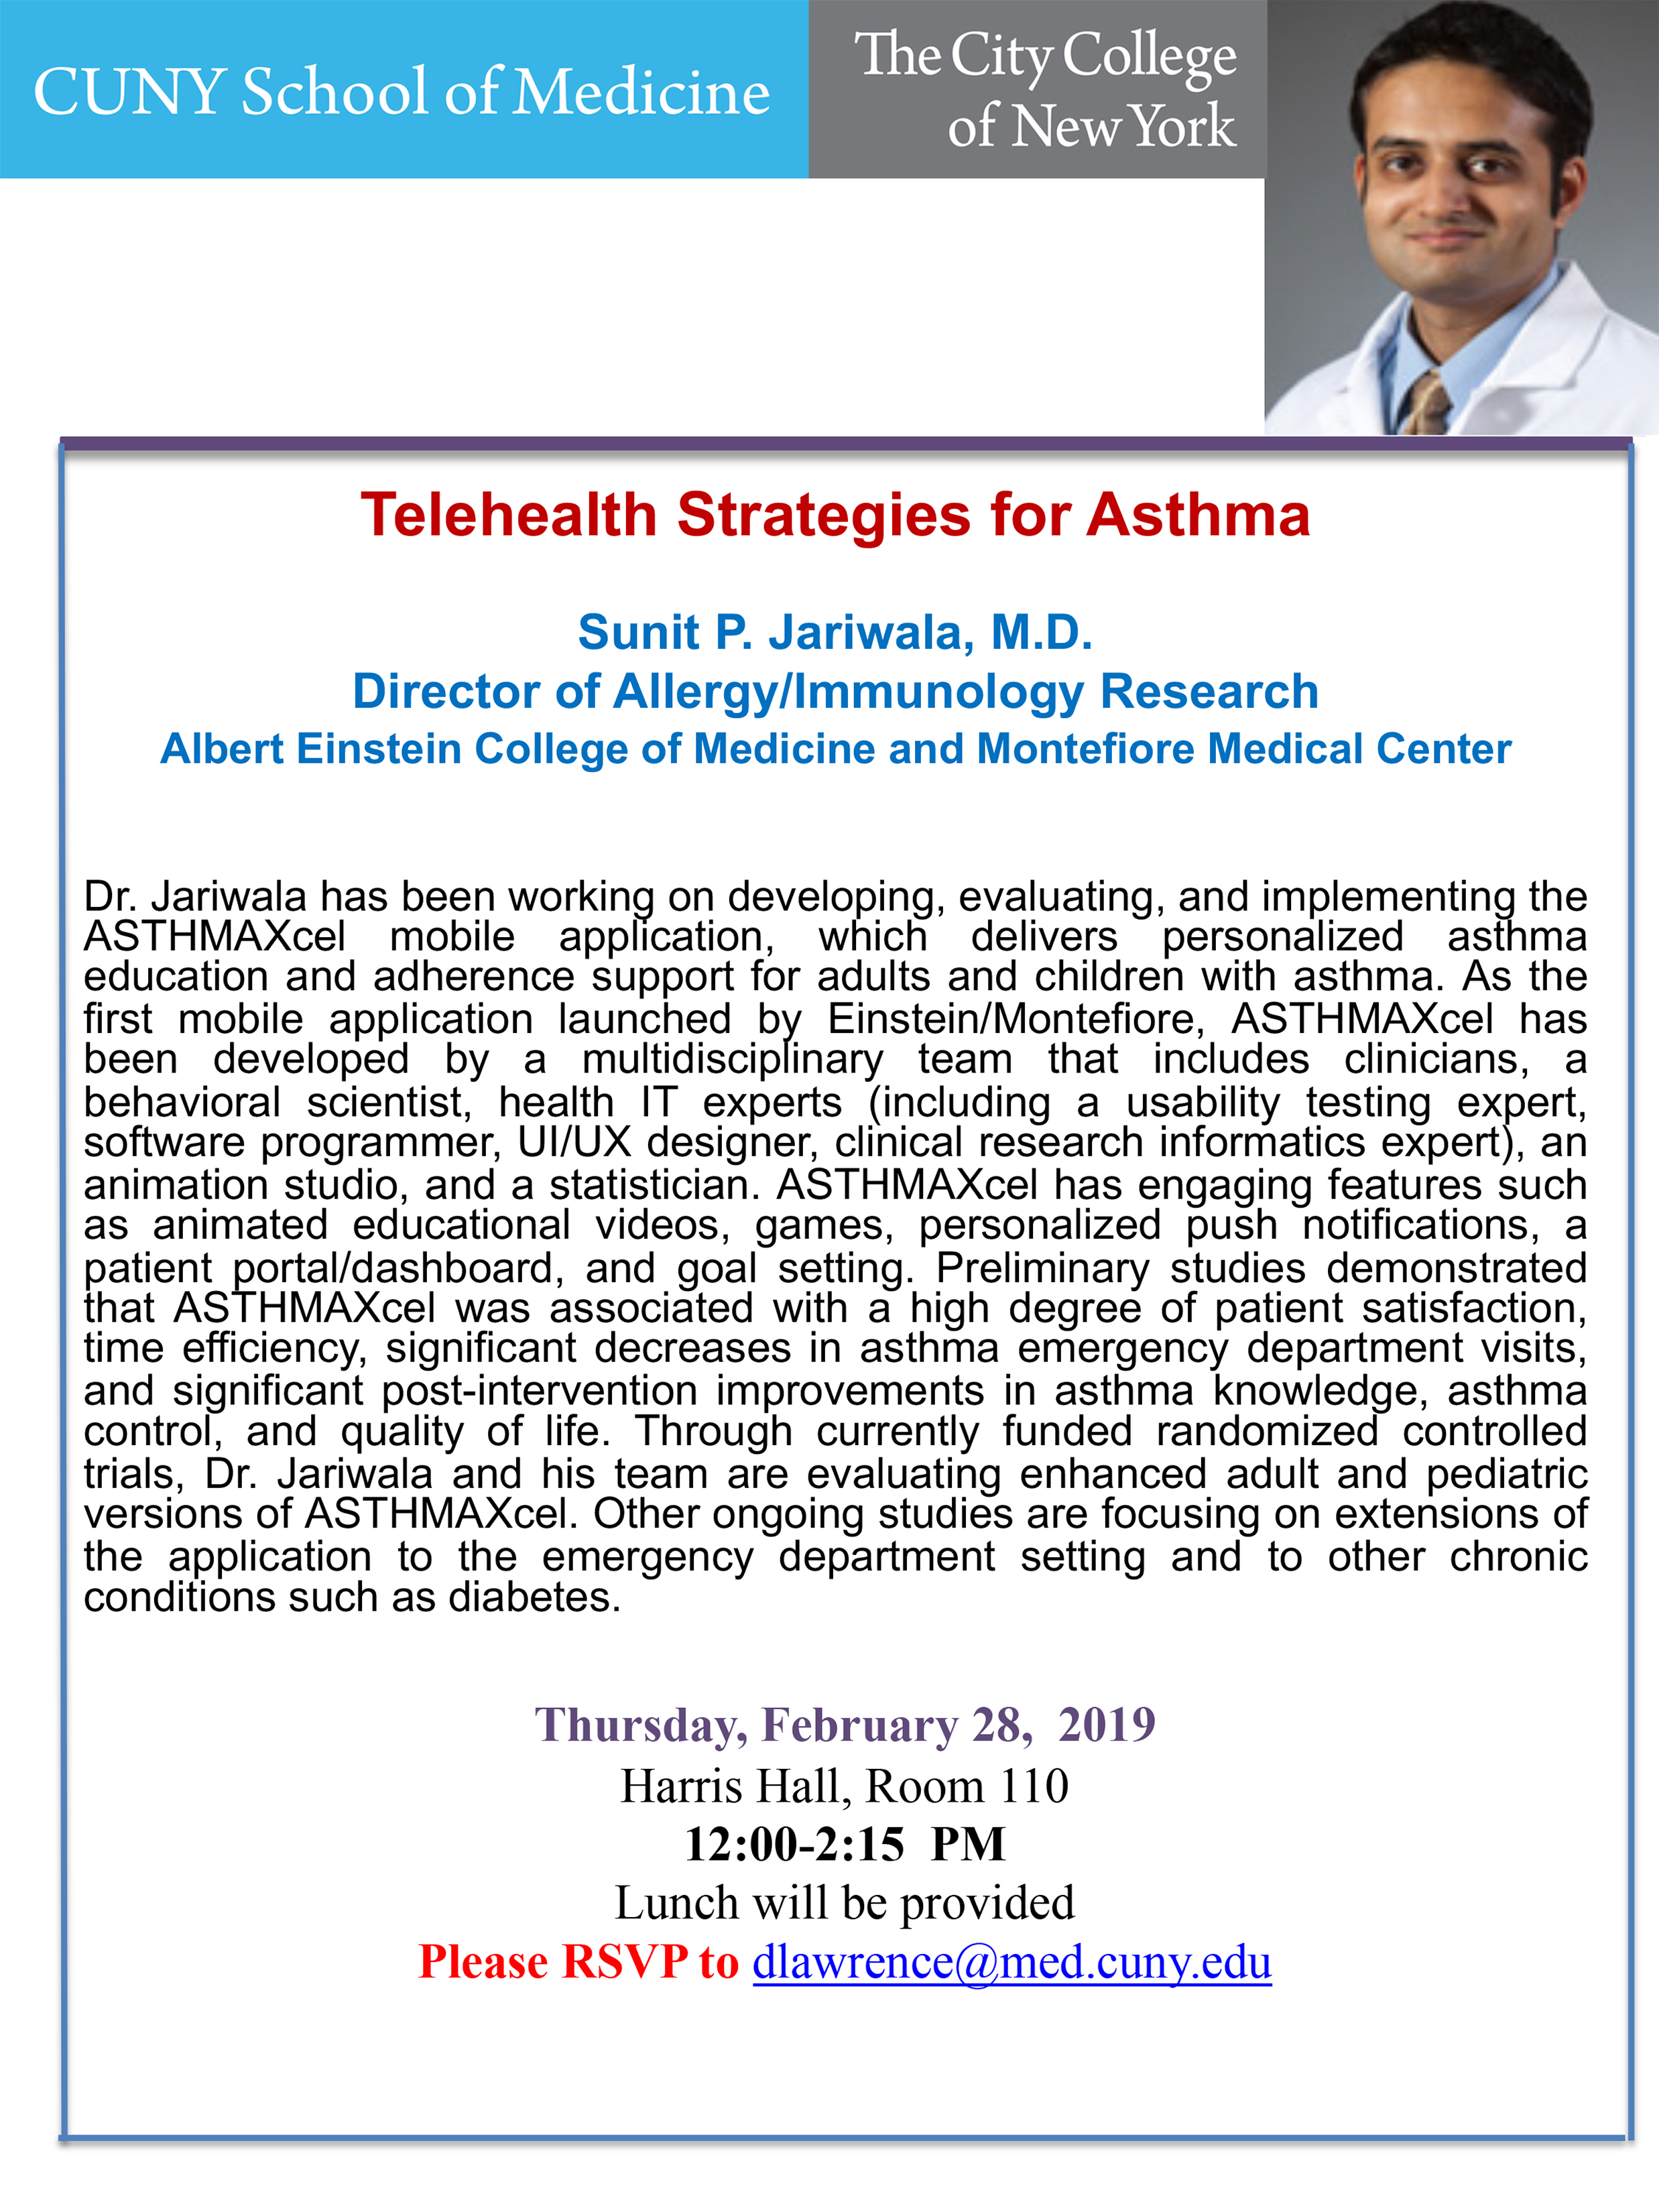 February 28 2019 Seminar Hosted by Sunit P. Jariwala, M.D. - Telehealth Strategies for Asthma